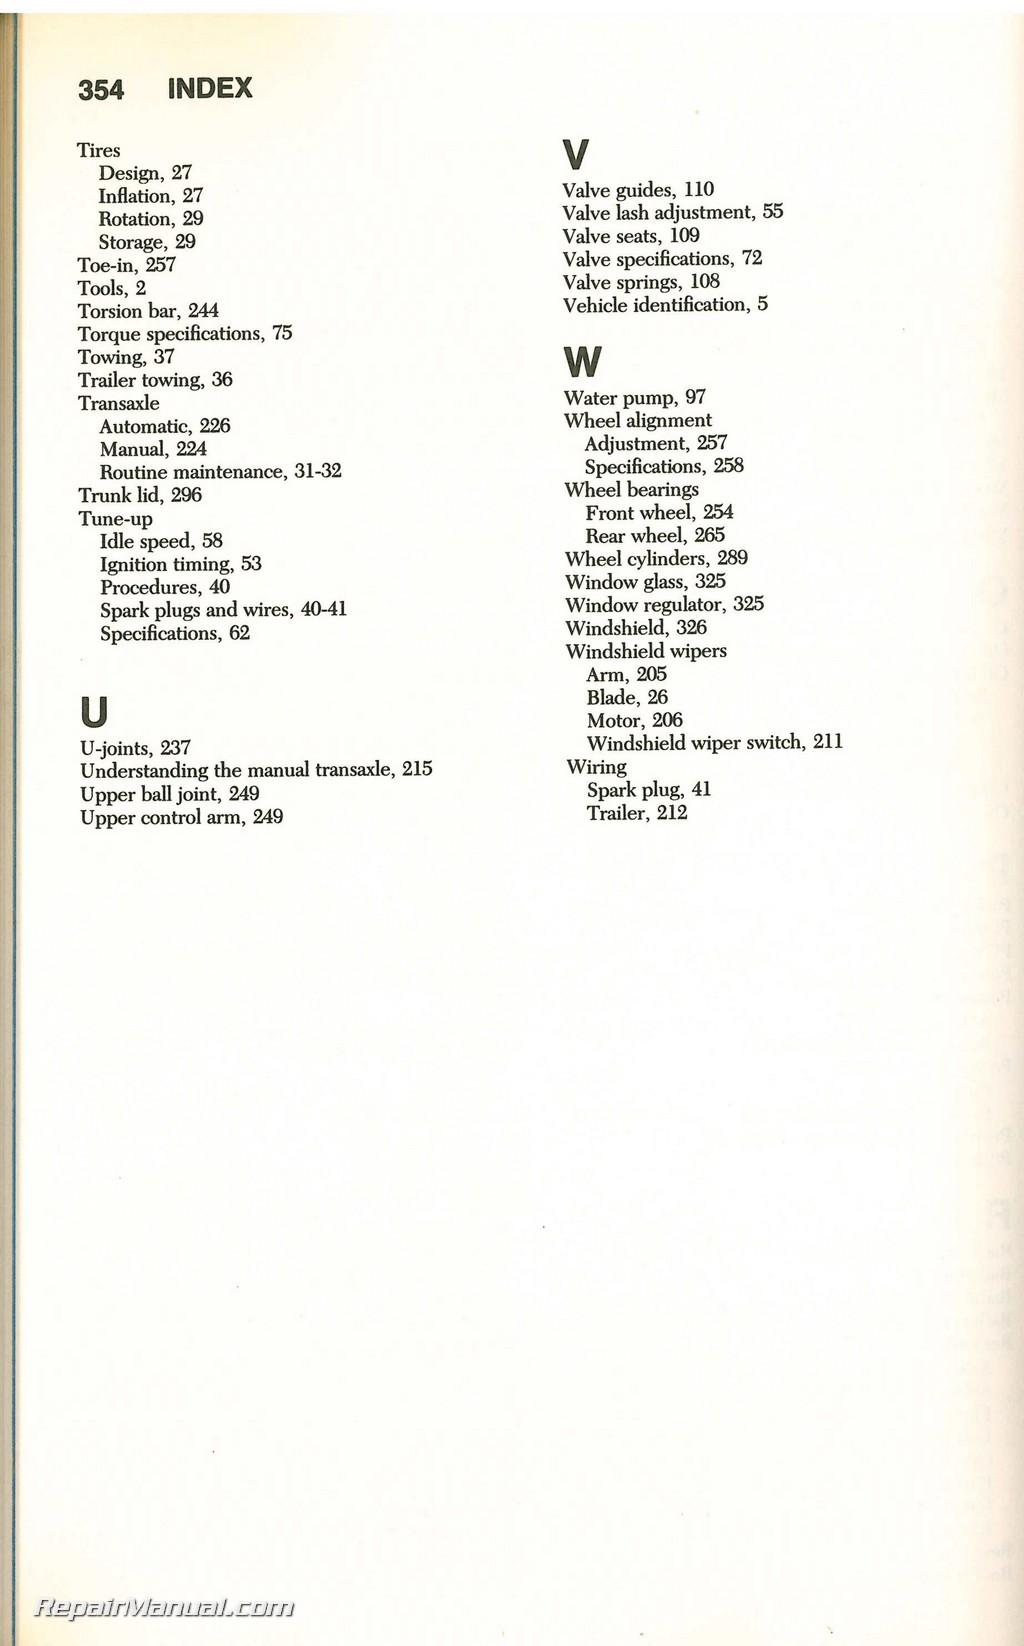 civic crx 1986 service manual pdf